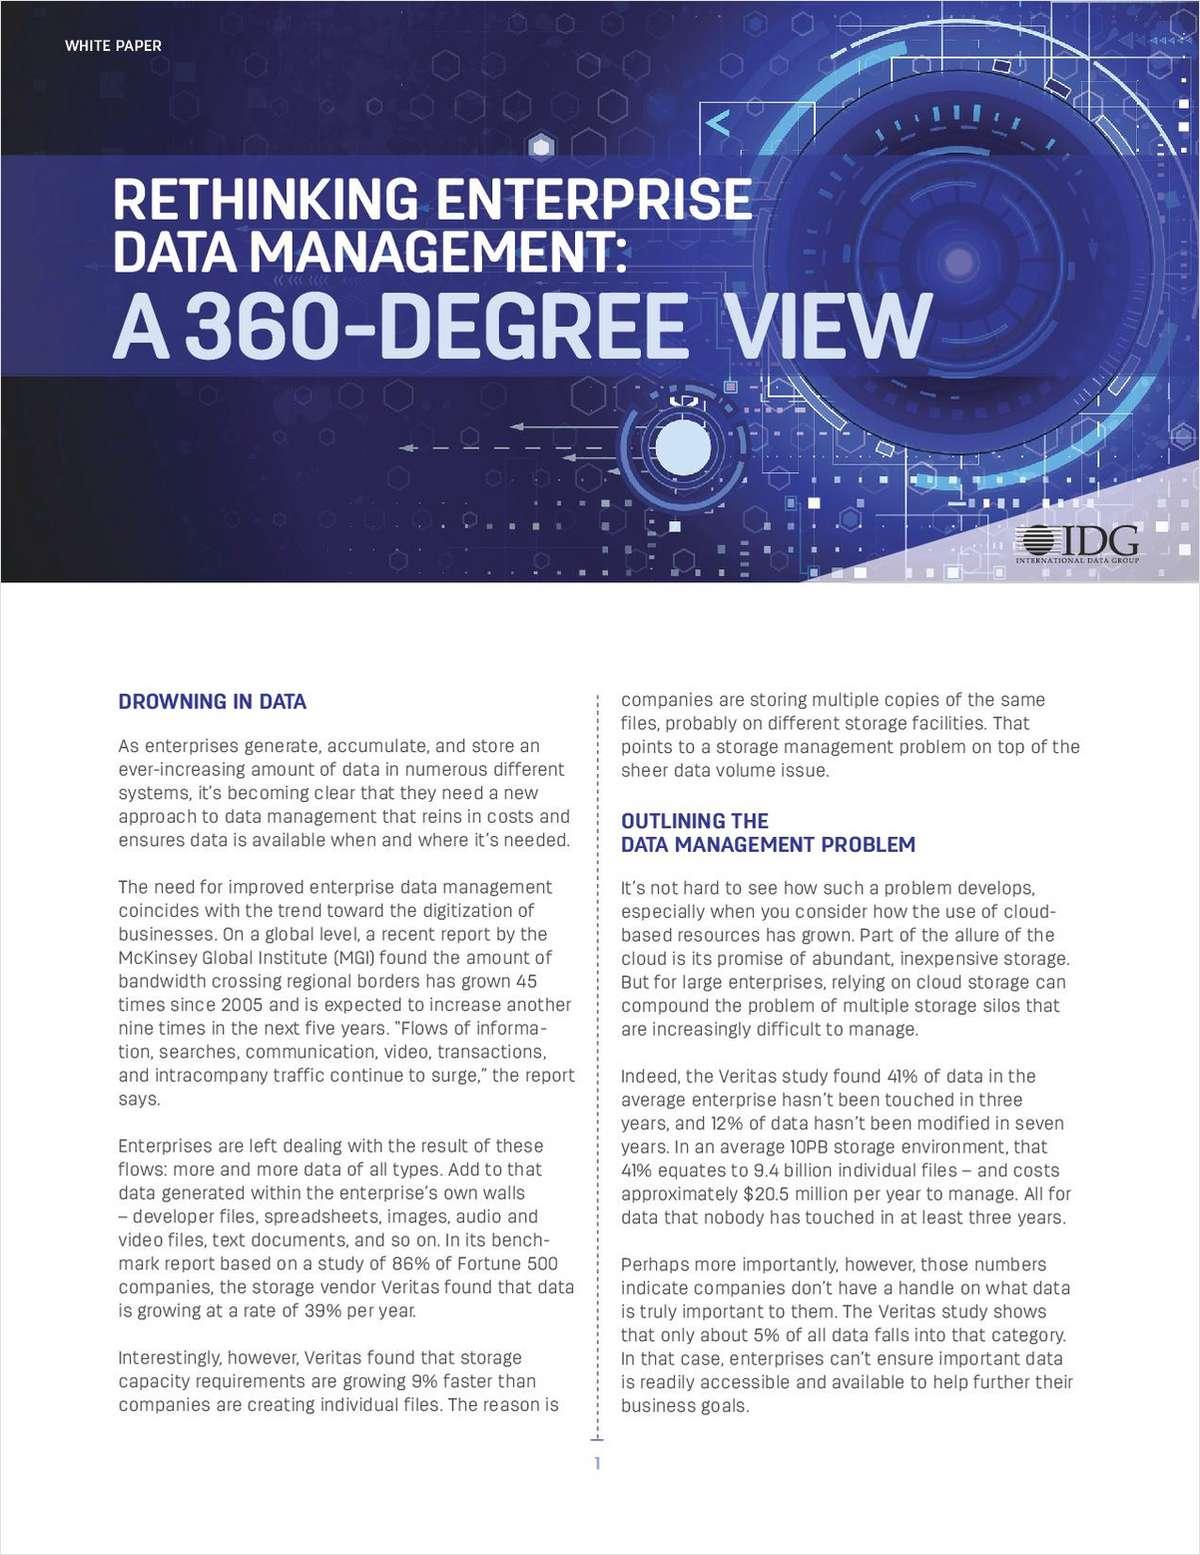 Rethinking Enterprise Data Management: A 360-Degree View